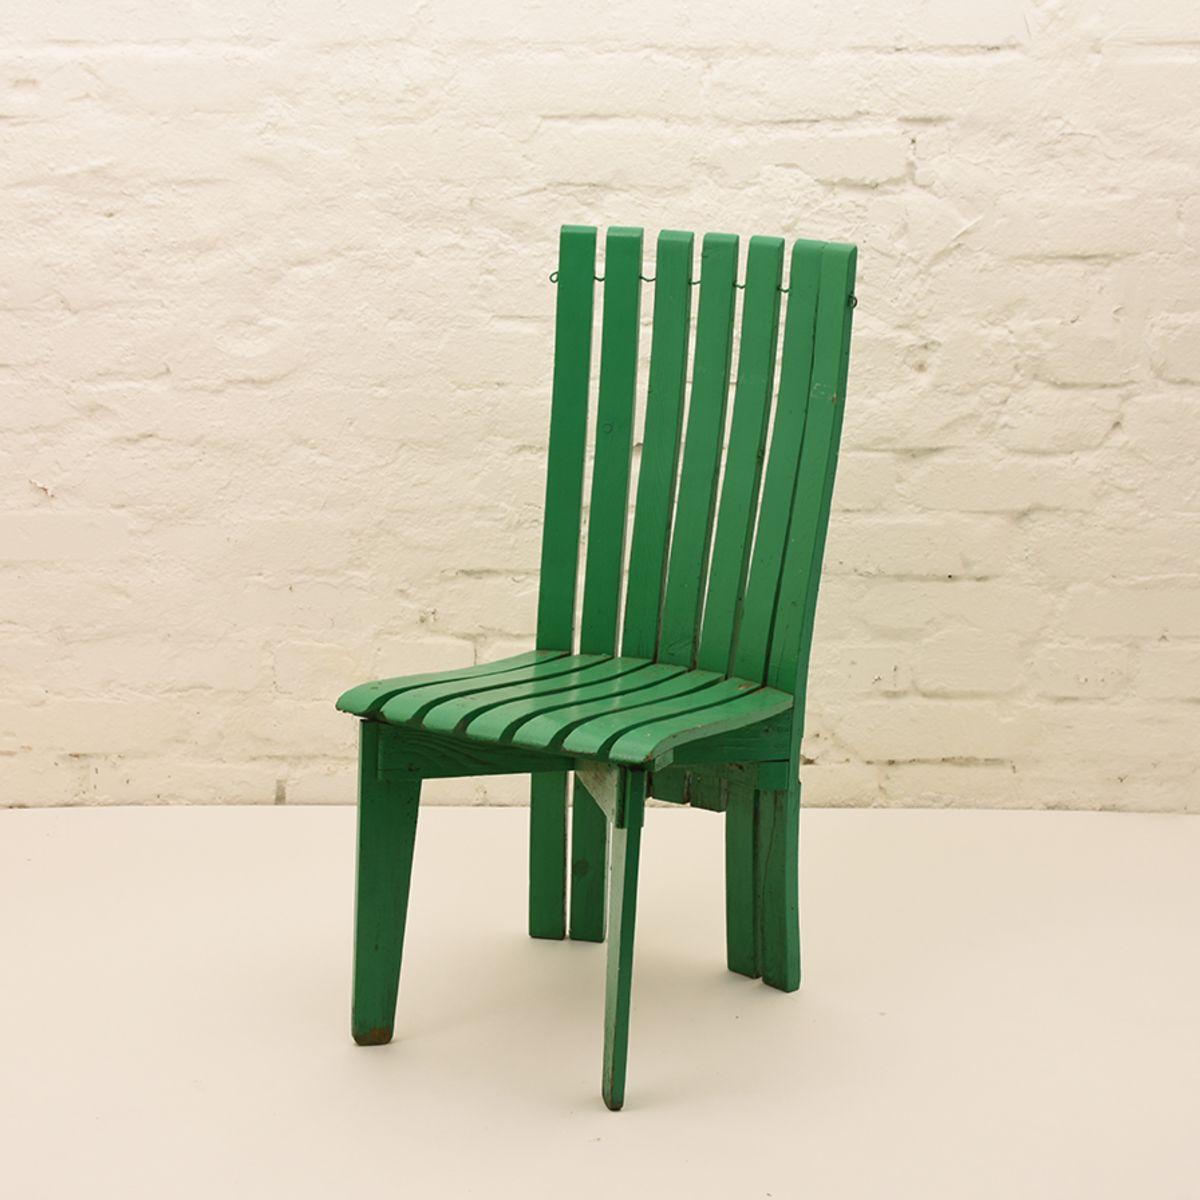 Alvar-Aalto_Sunflower-Garden-Chair-Green_01